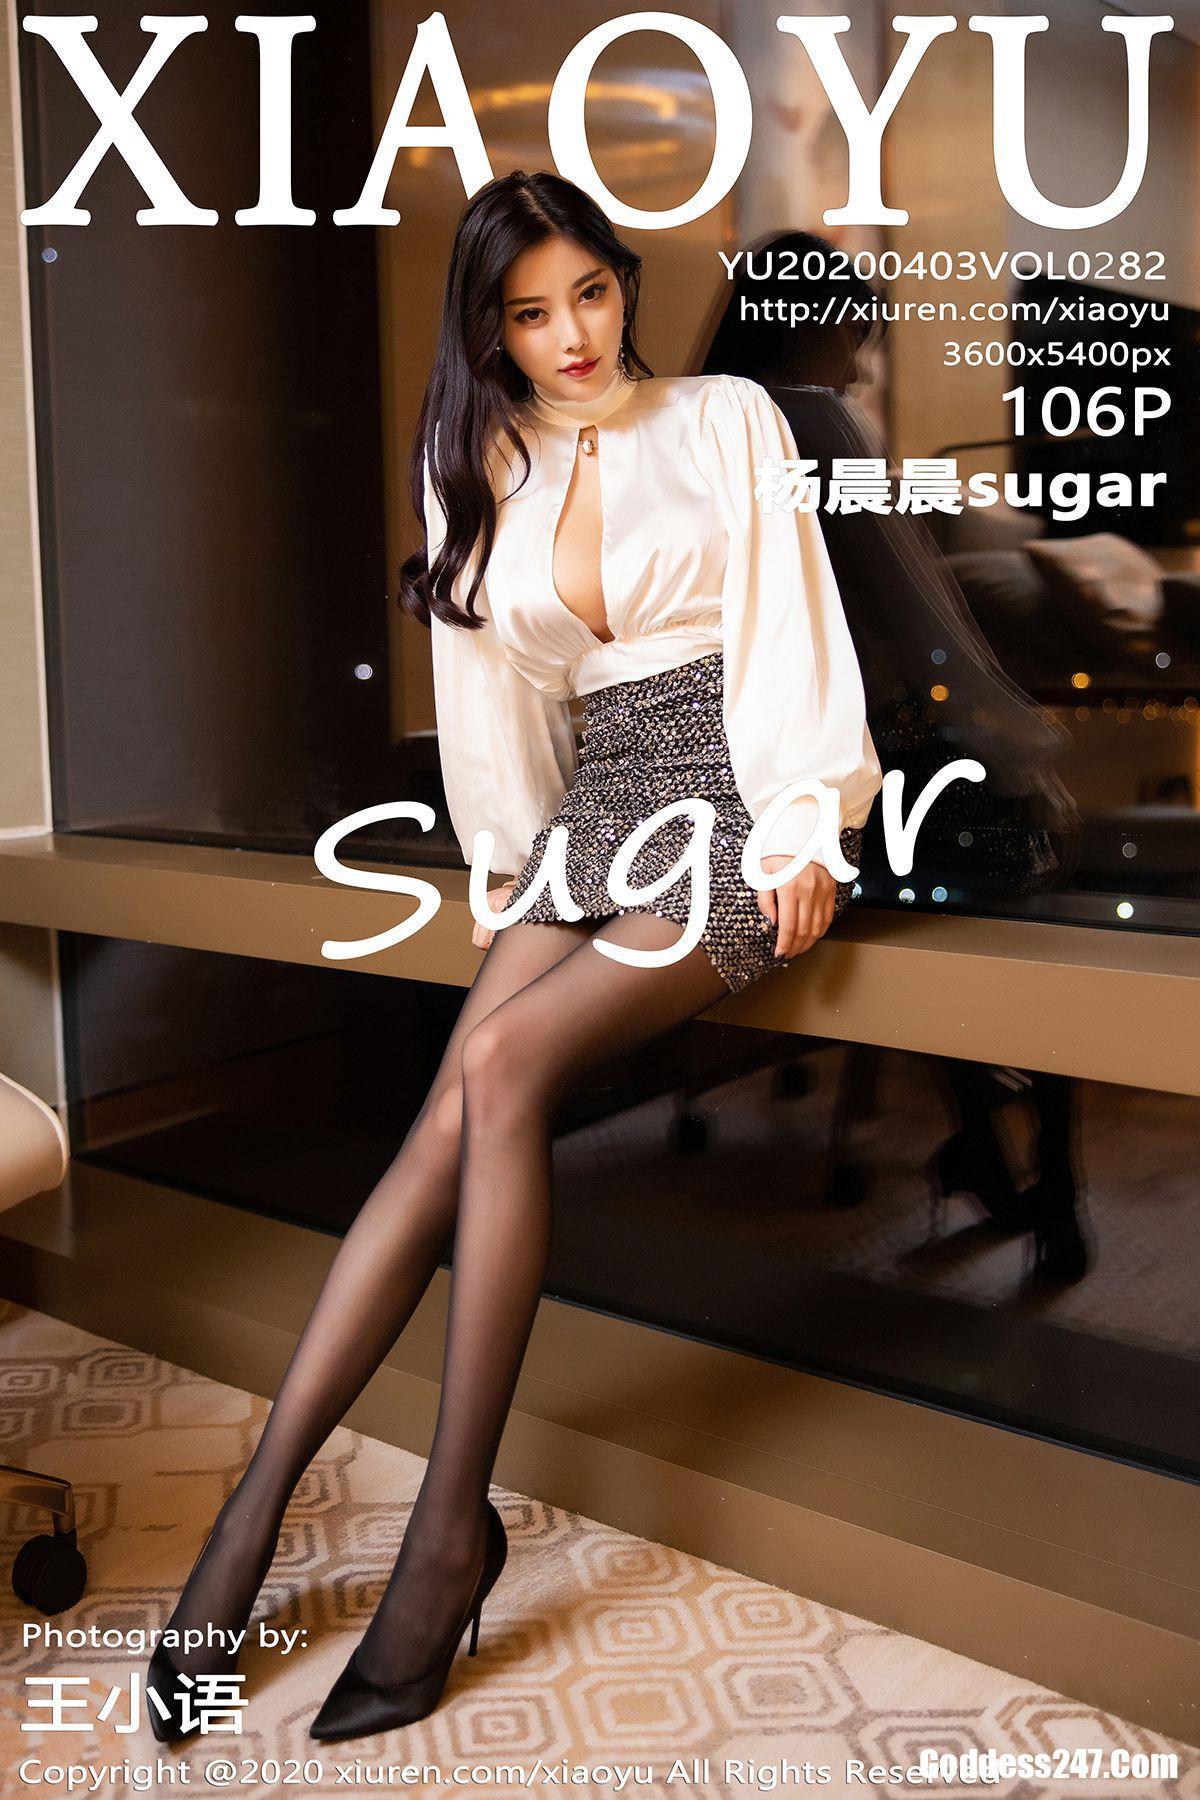 XiaoYu Vol.282 杨晨晨sugar